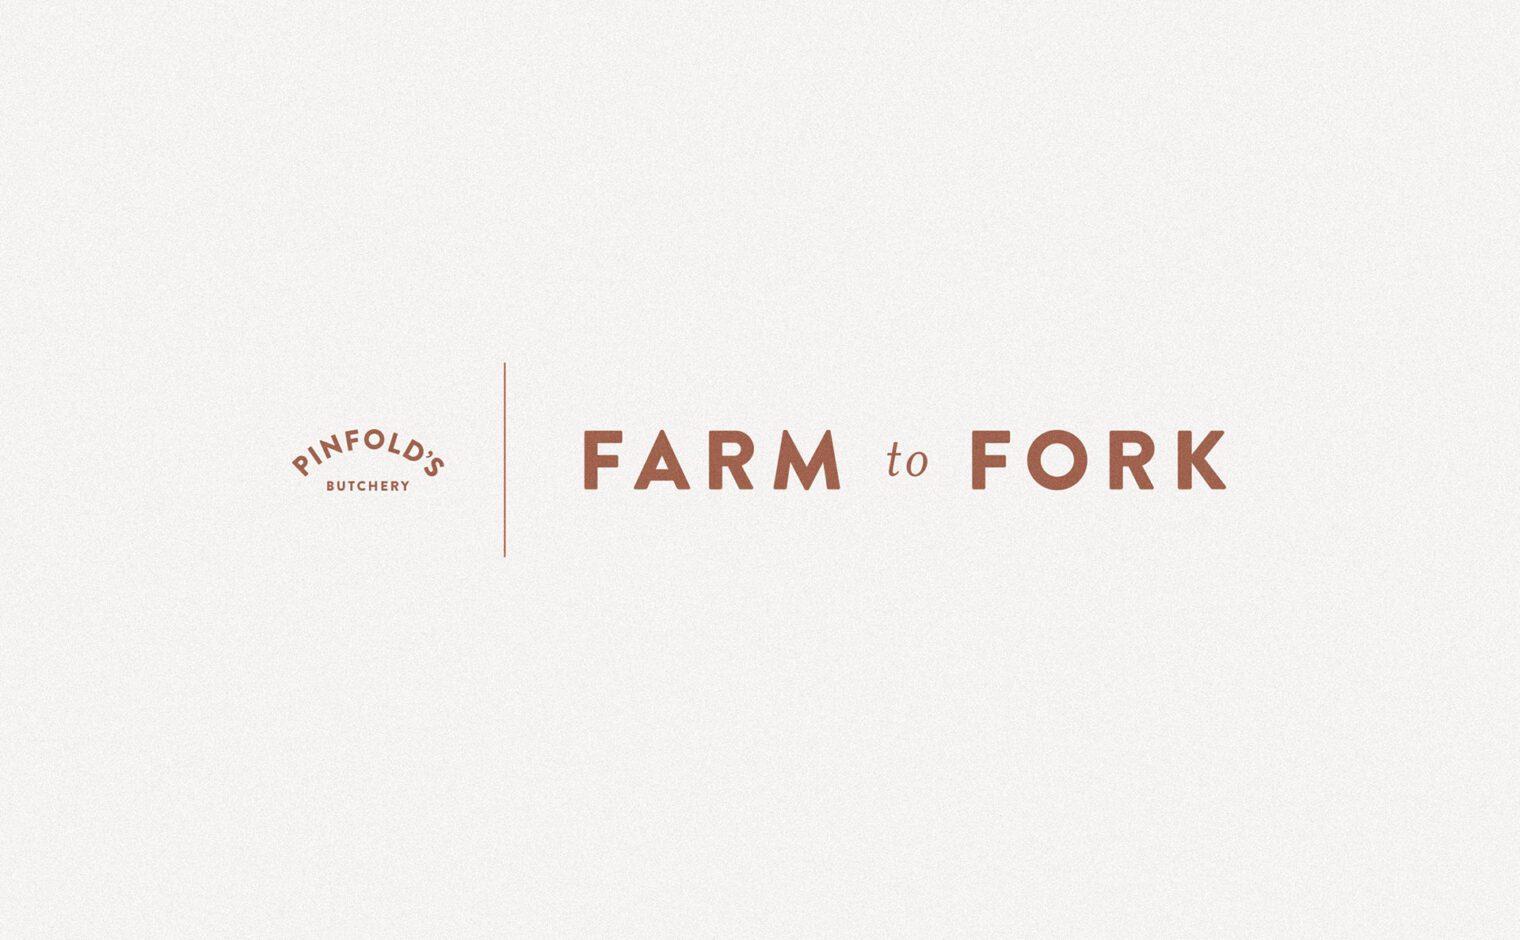 Pinfold Farm Shop farm to fork typography